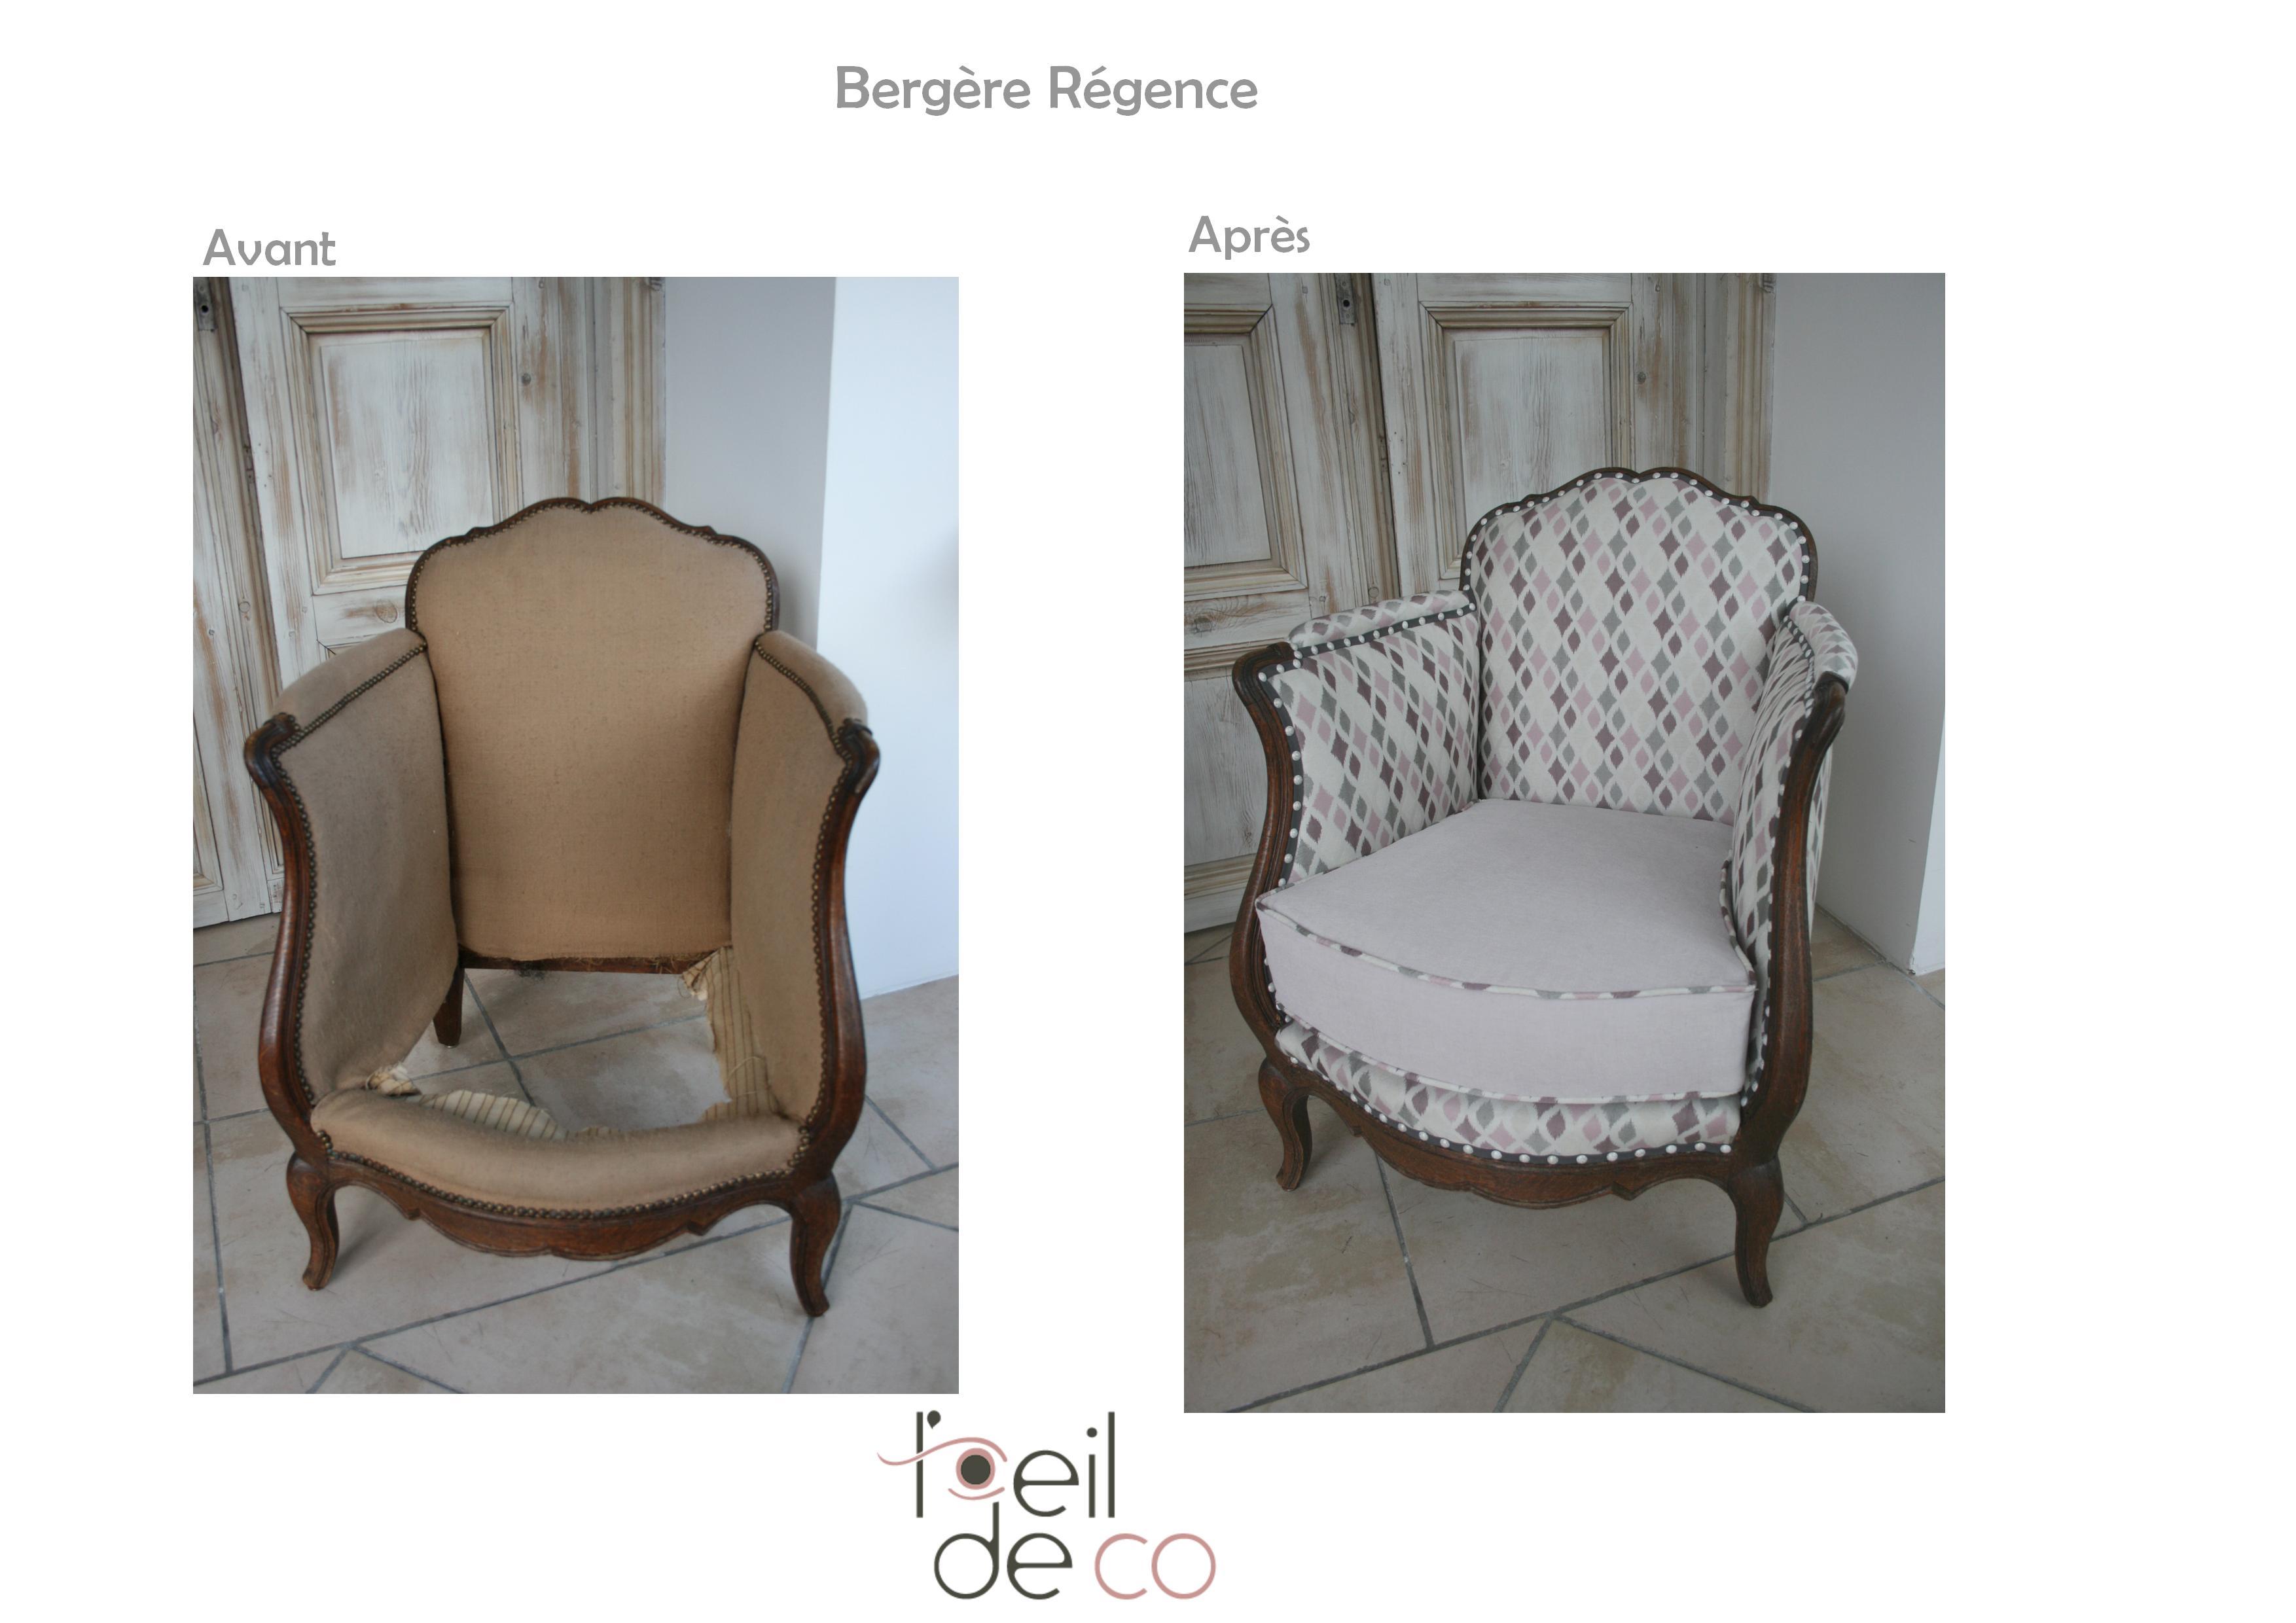 bergere_regence